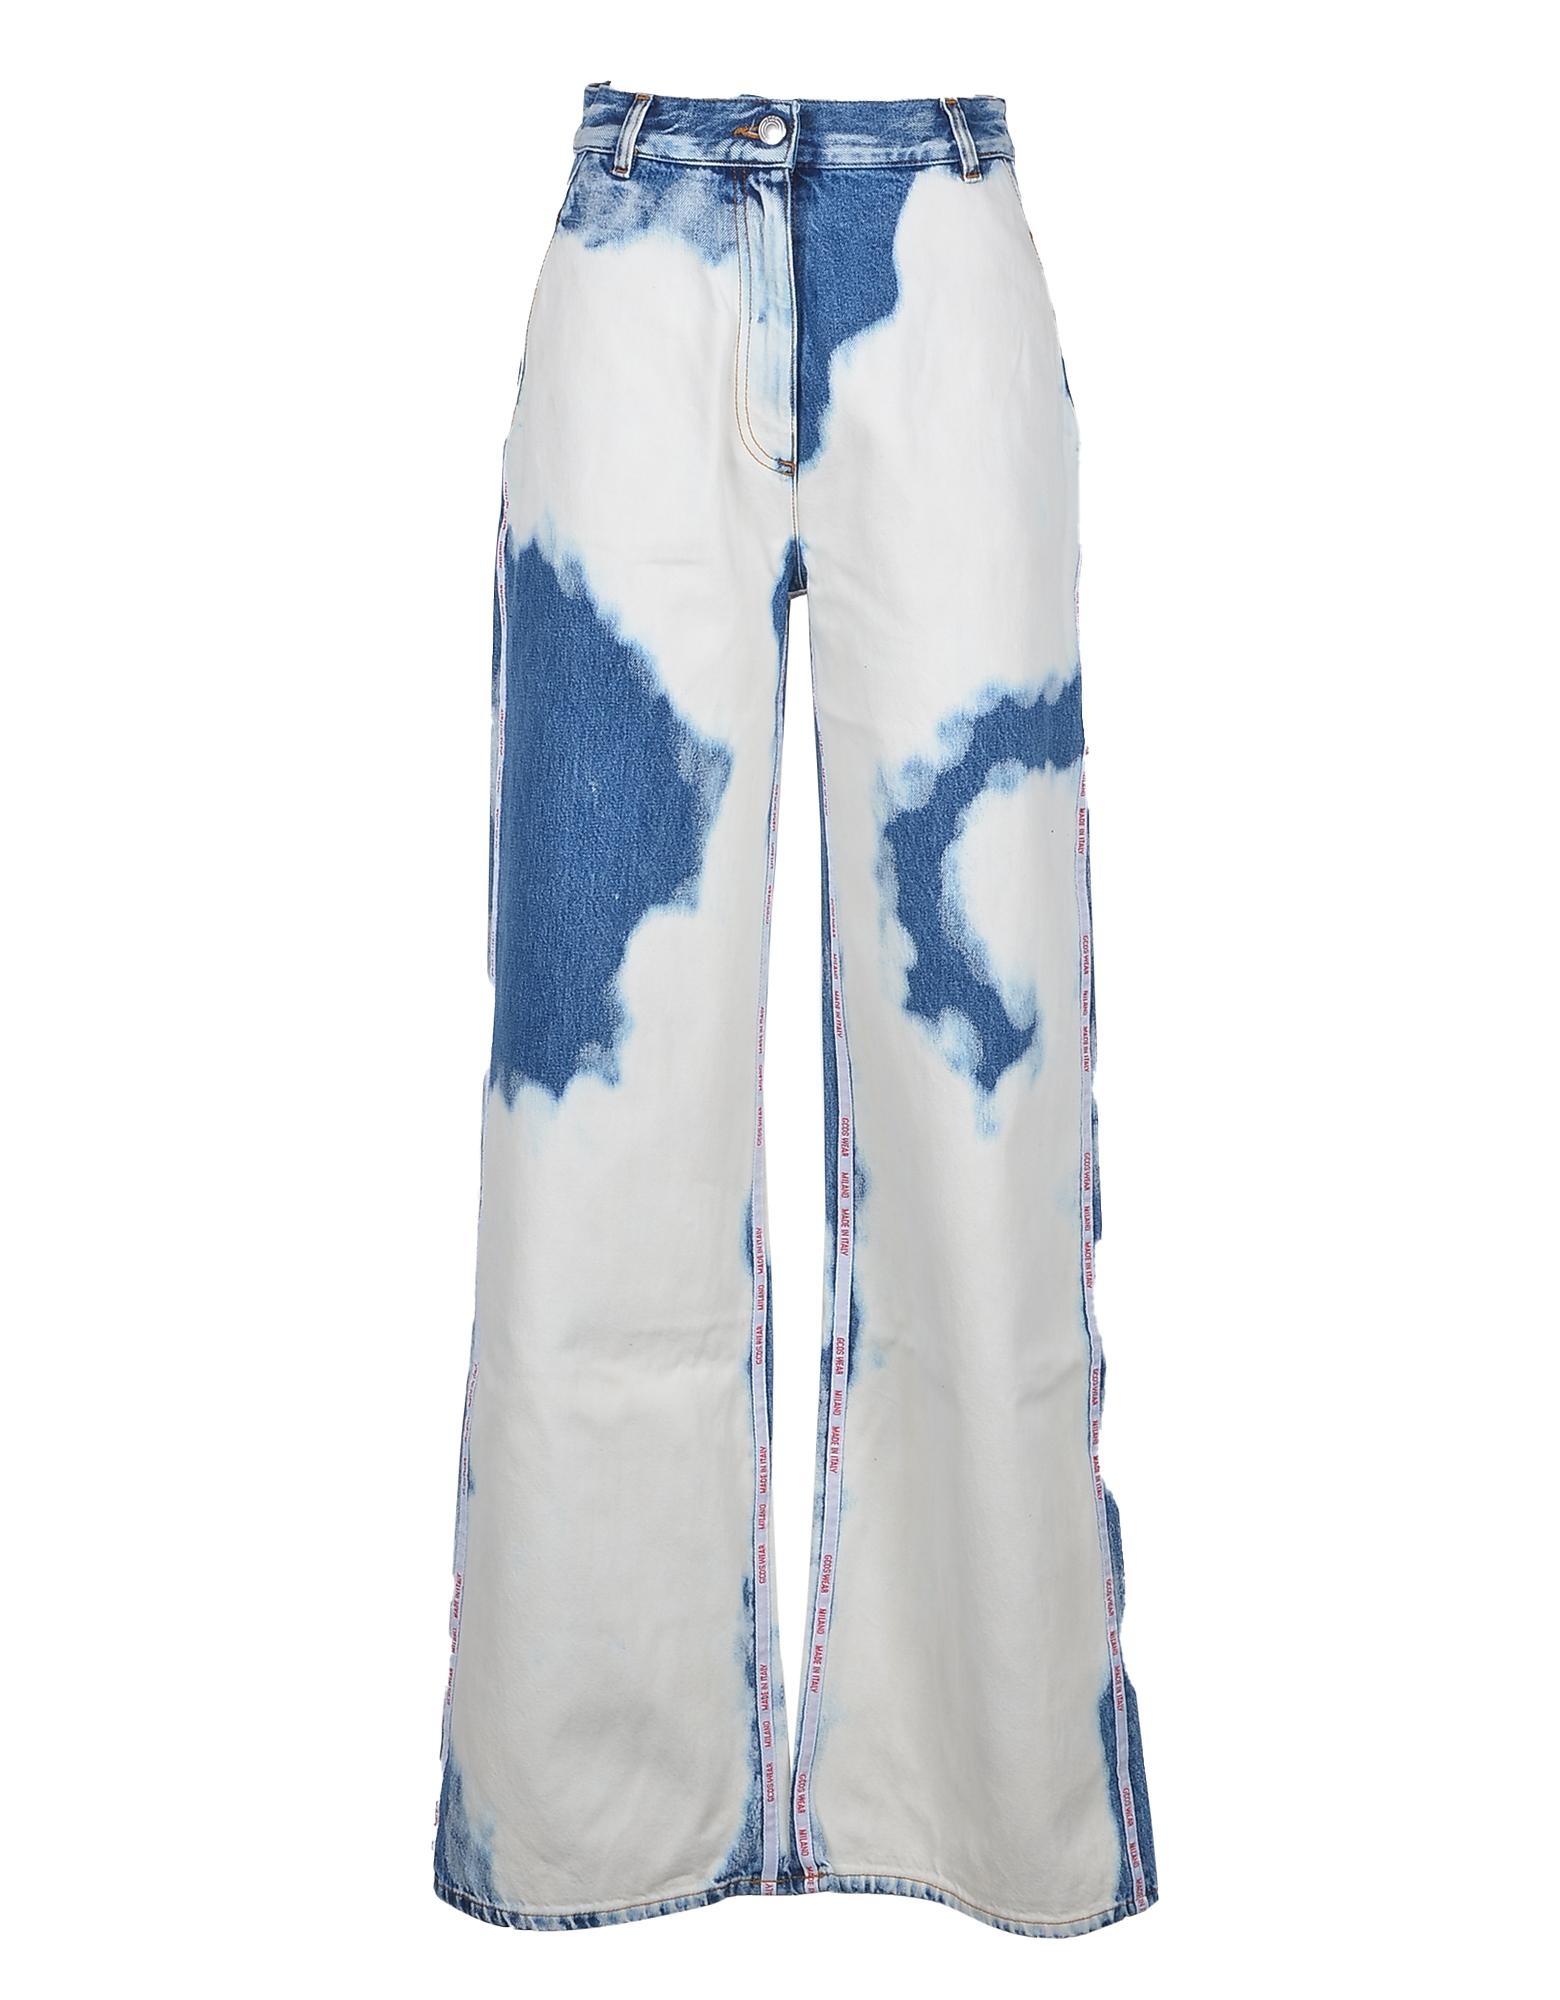 GCDS Designer Jeans, Women's White / Blue Jeans